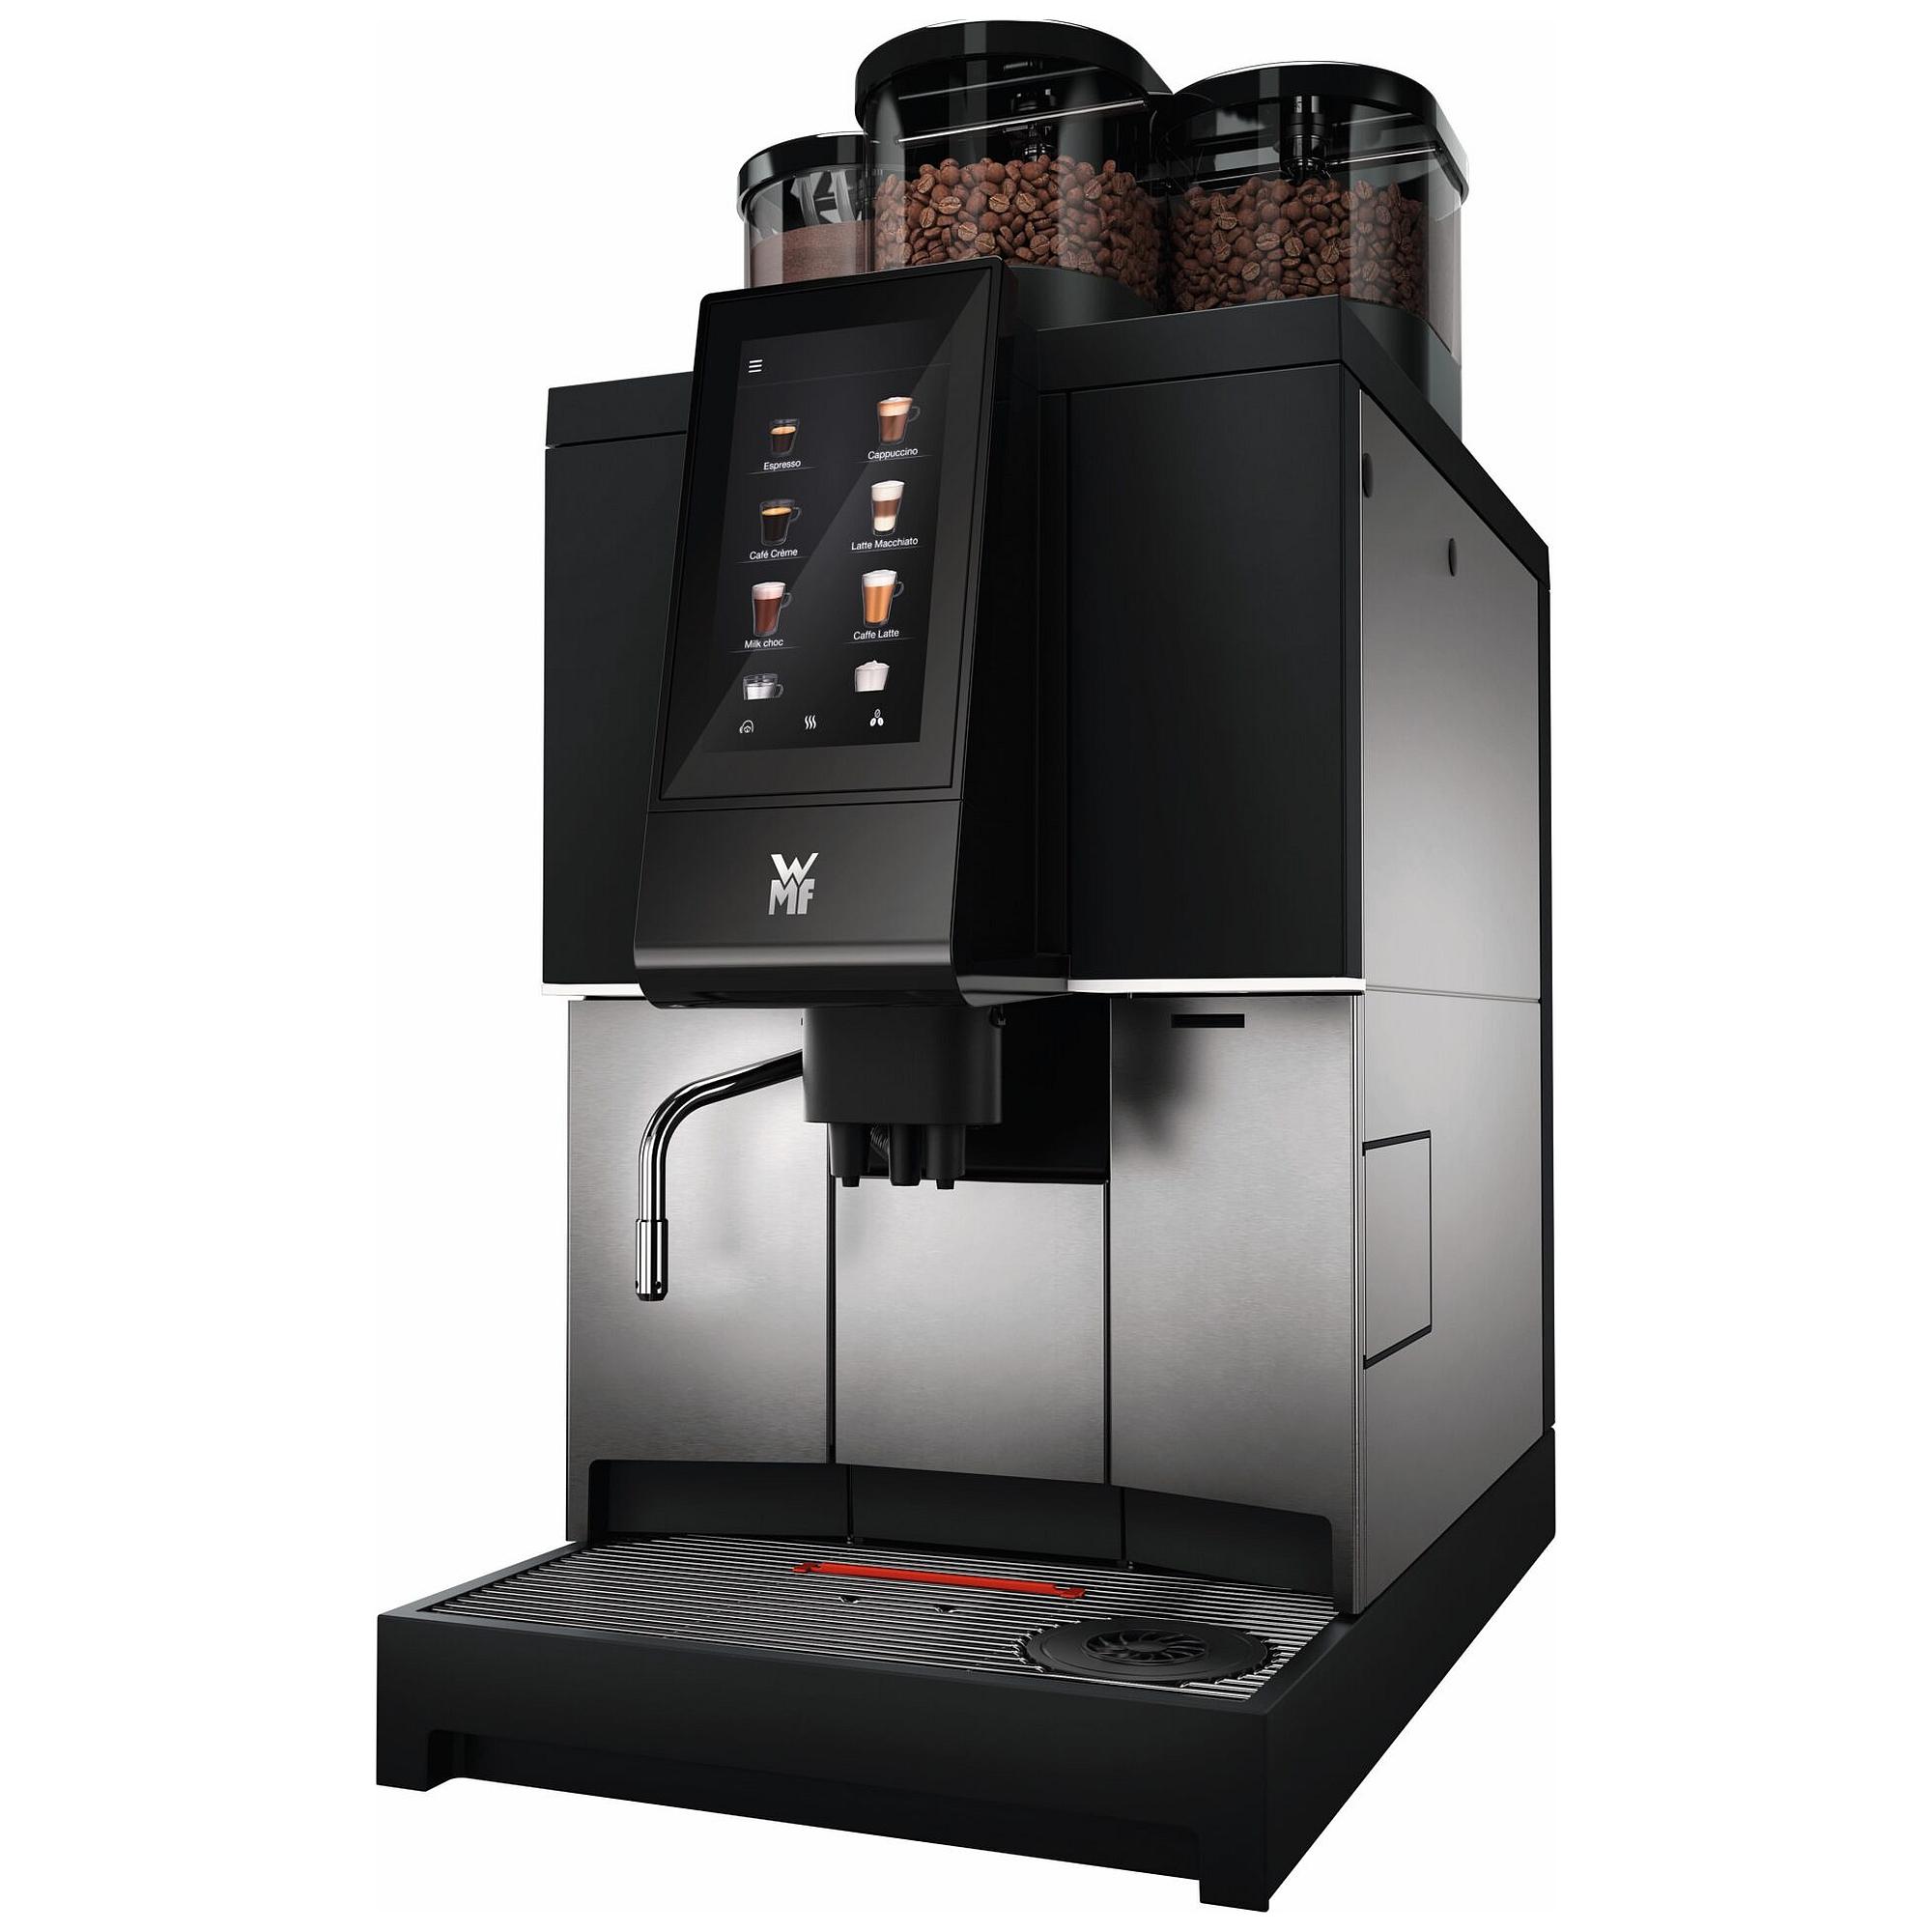 WMF 1300S Coffee Machine